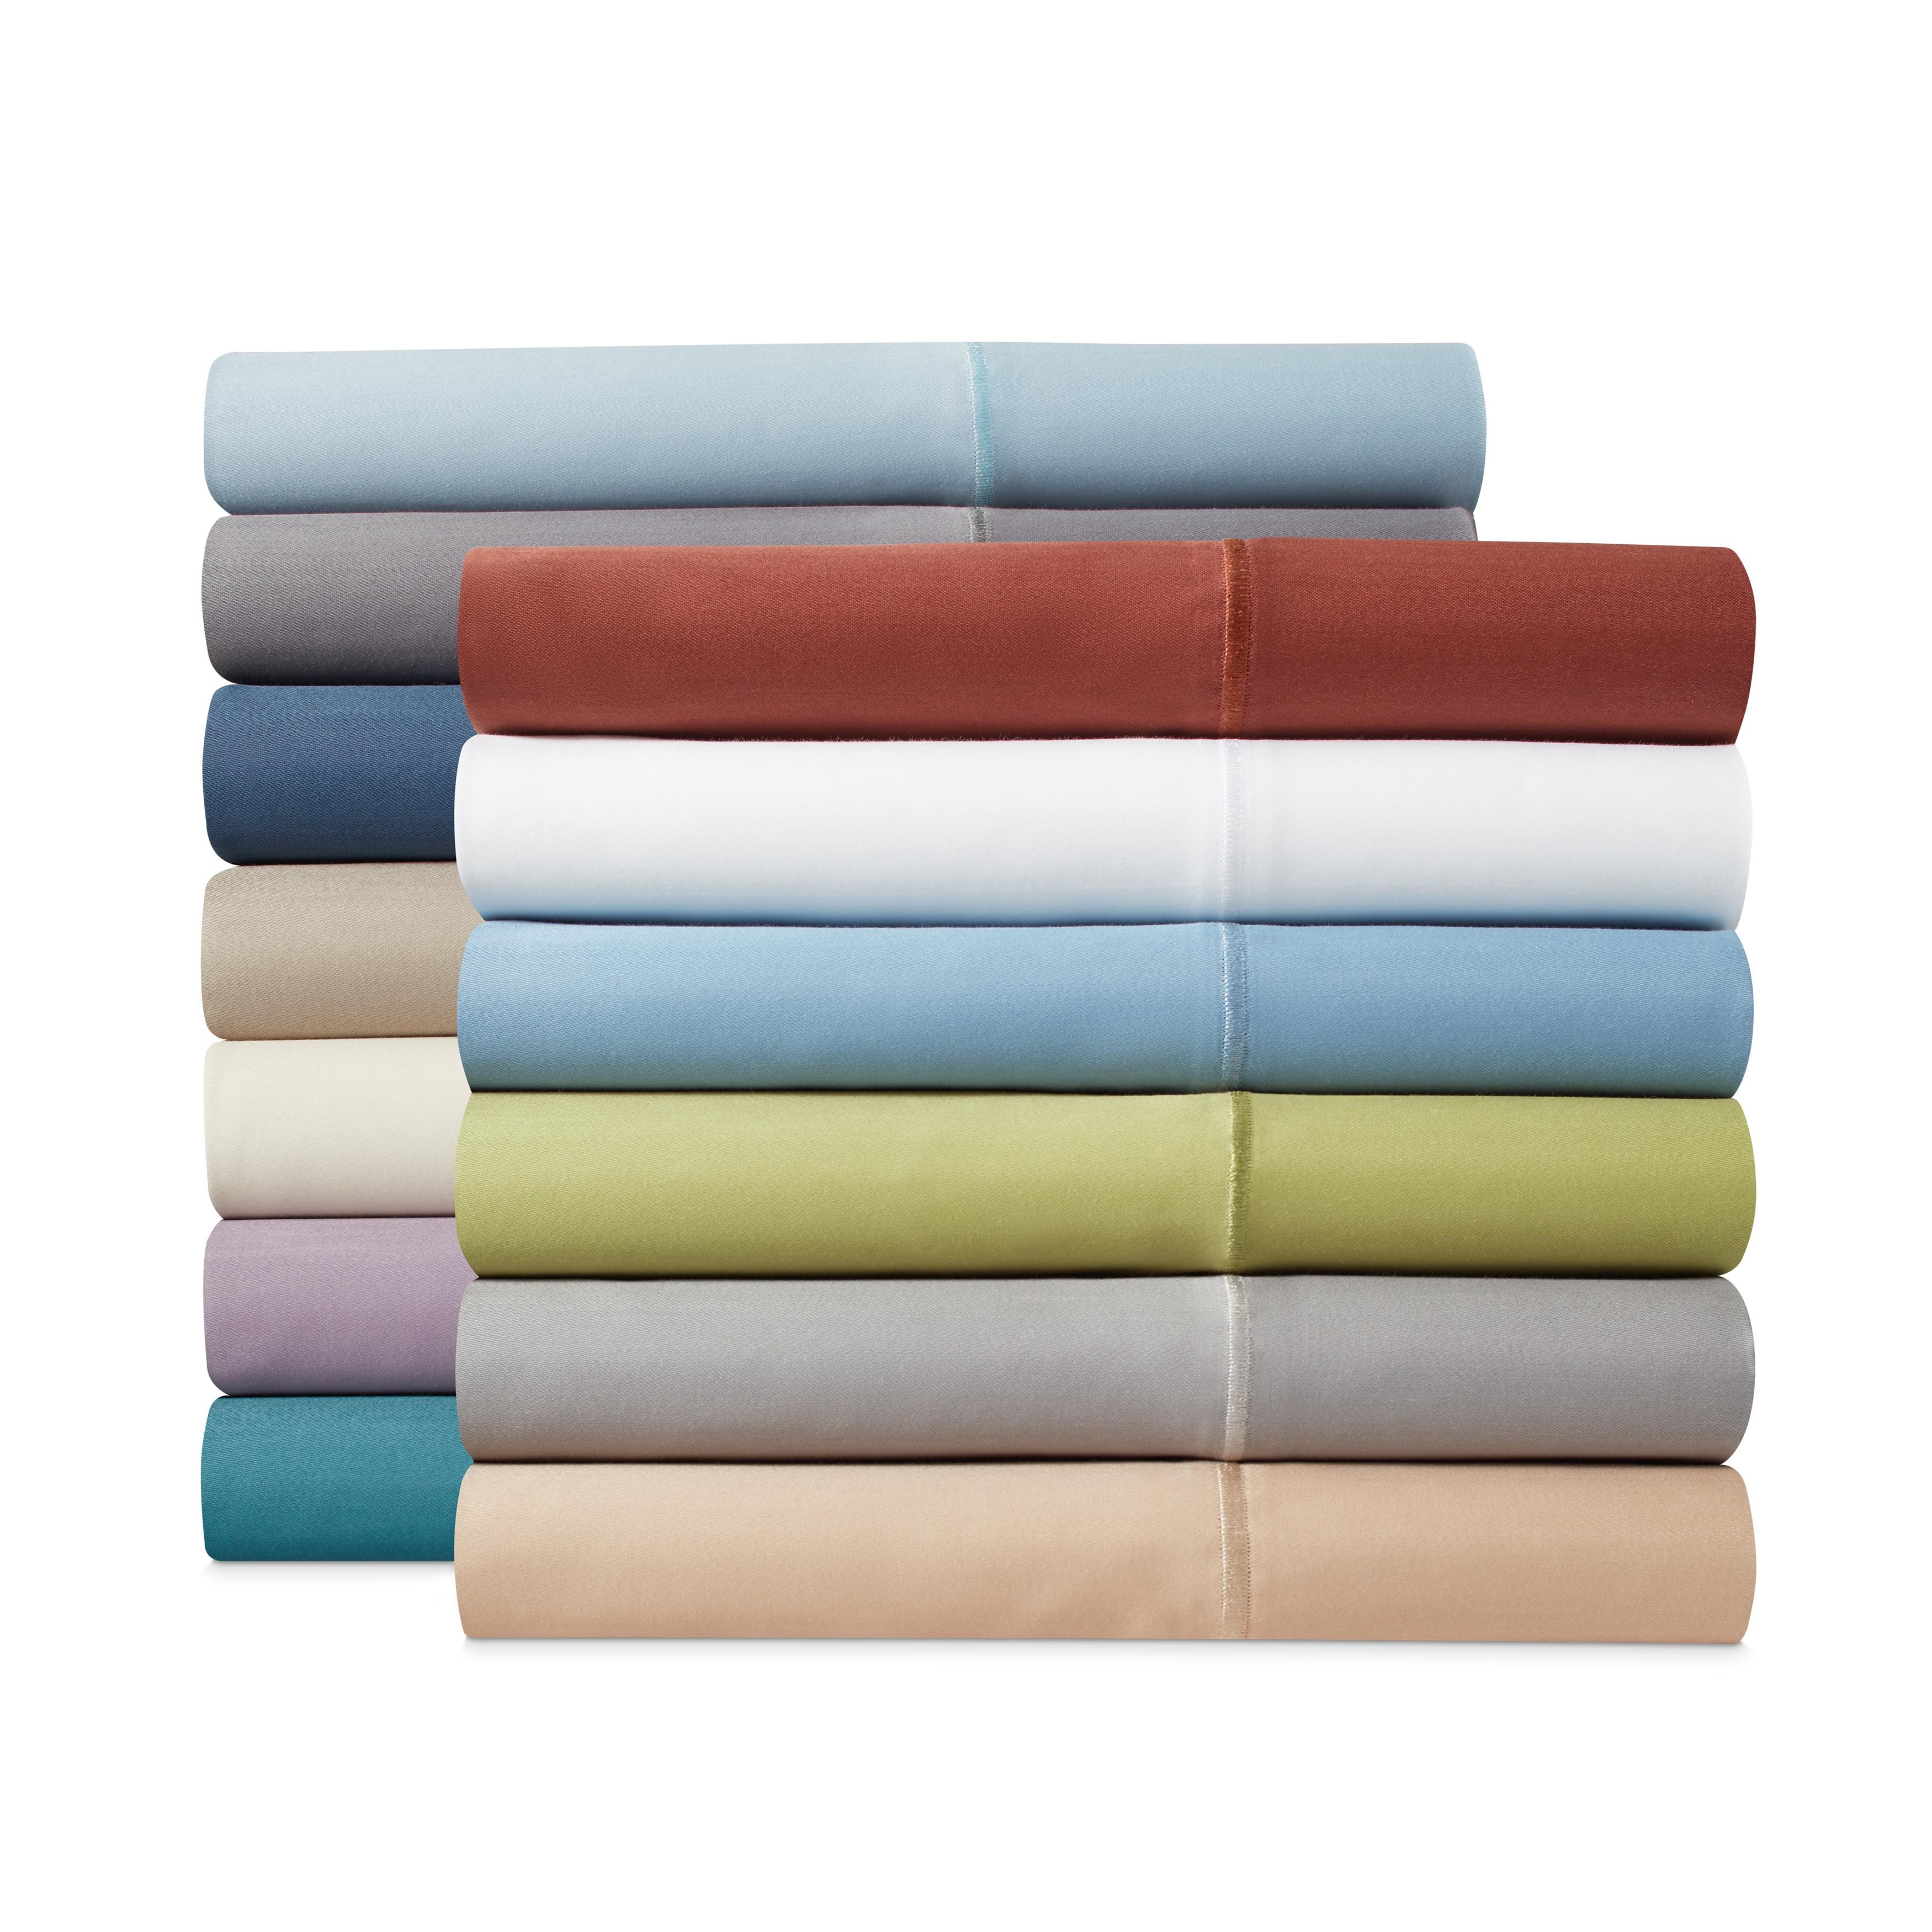 Luxury Sateen Cotton Blend 1000 Thread Count Deep Pocket Sheet Set (Sage - Queen)